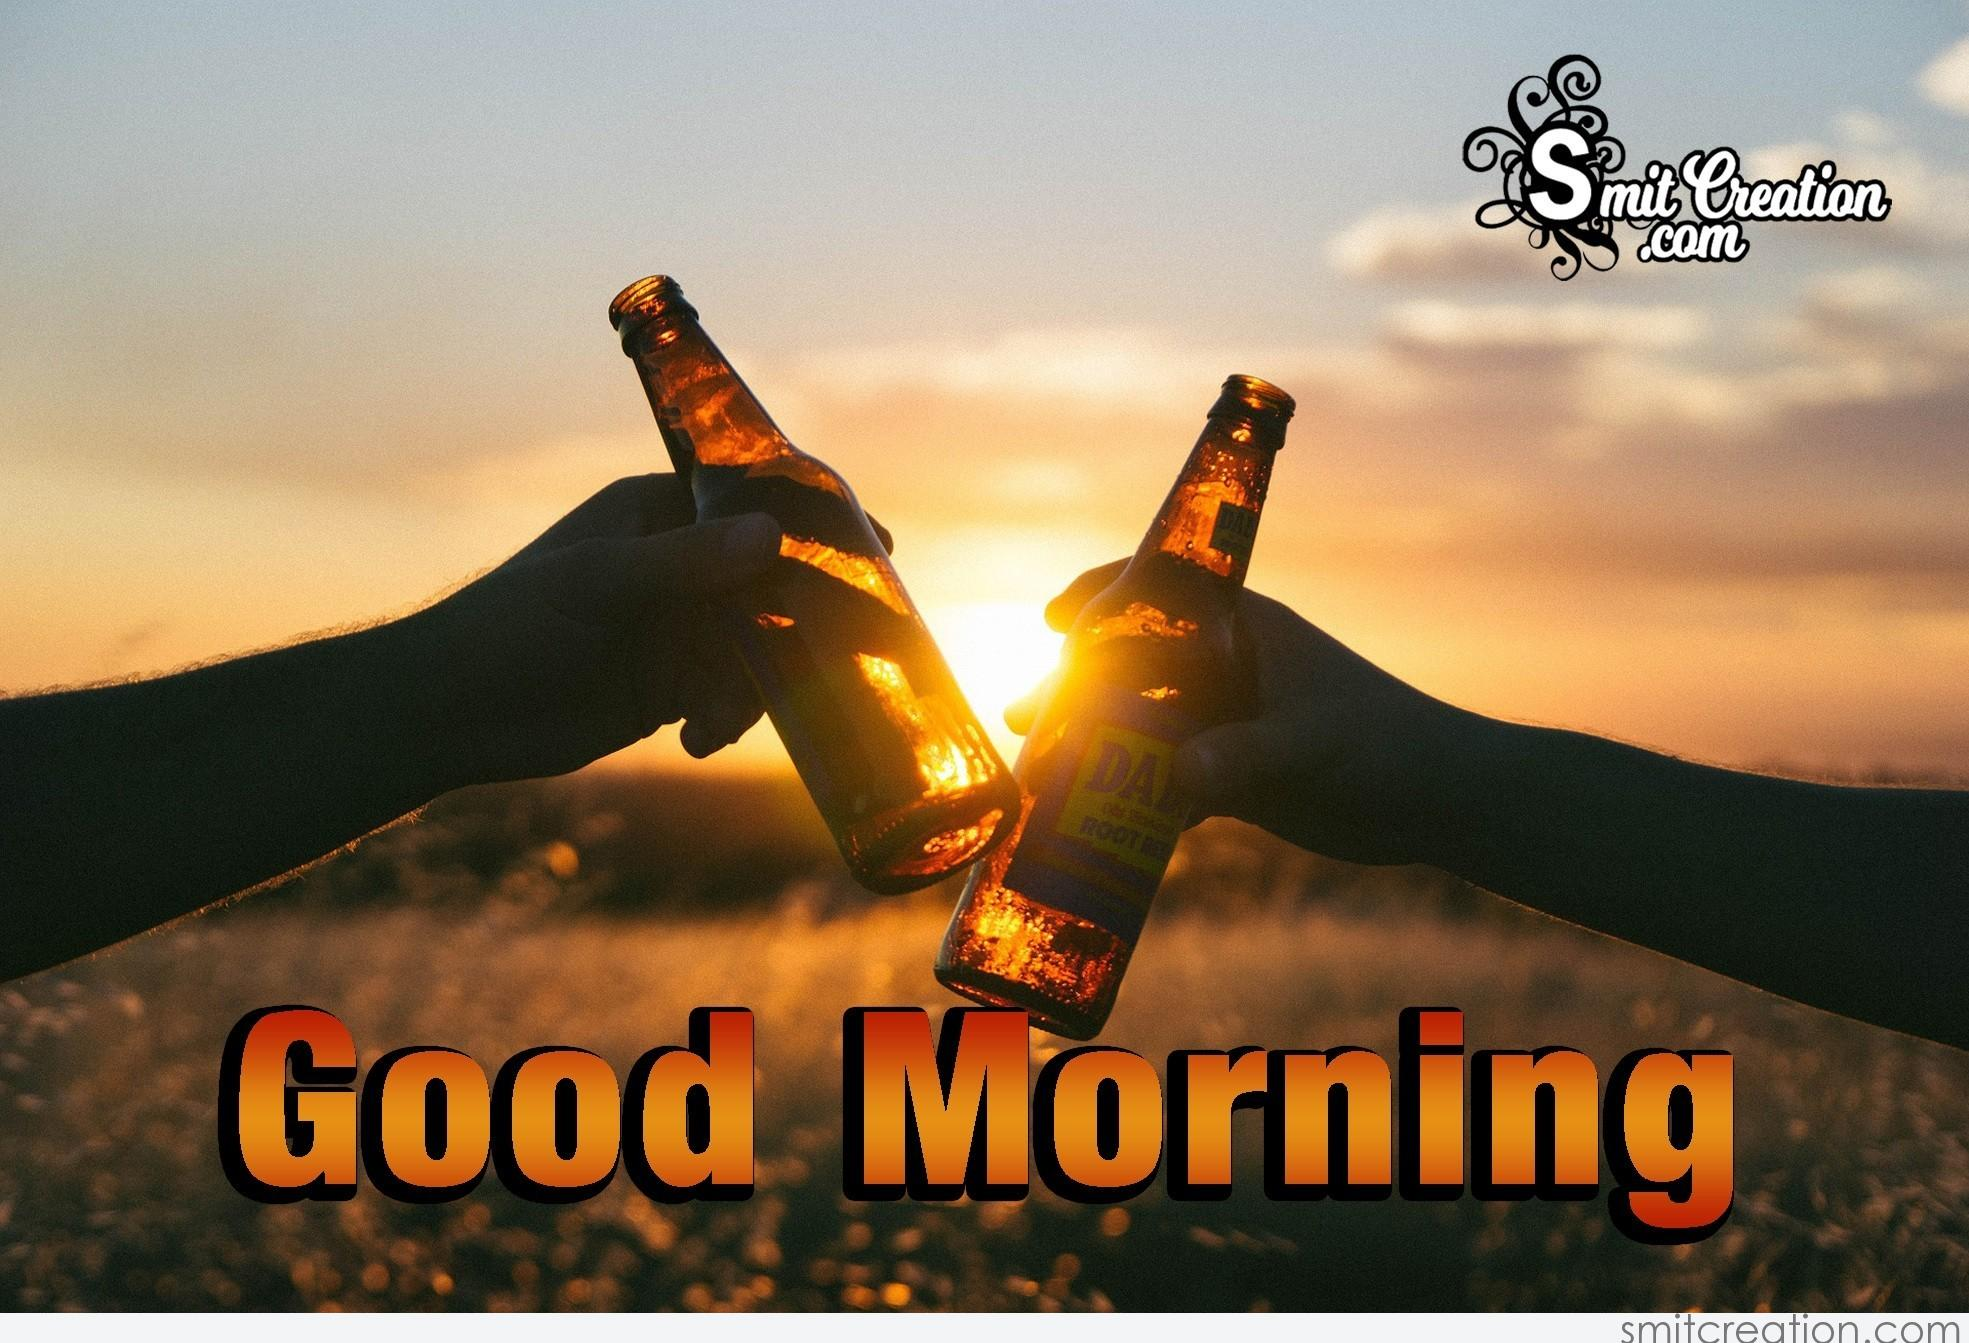 Good Morning Cheers Smitcreation Com